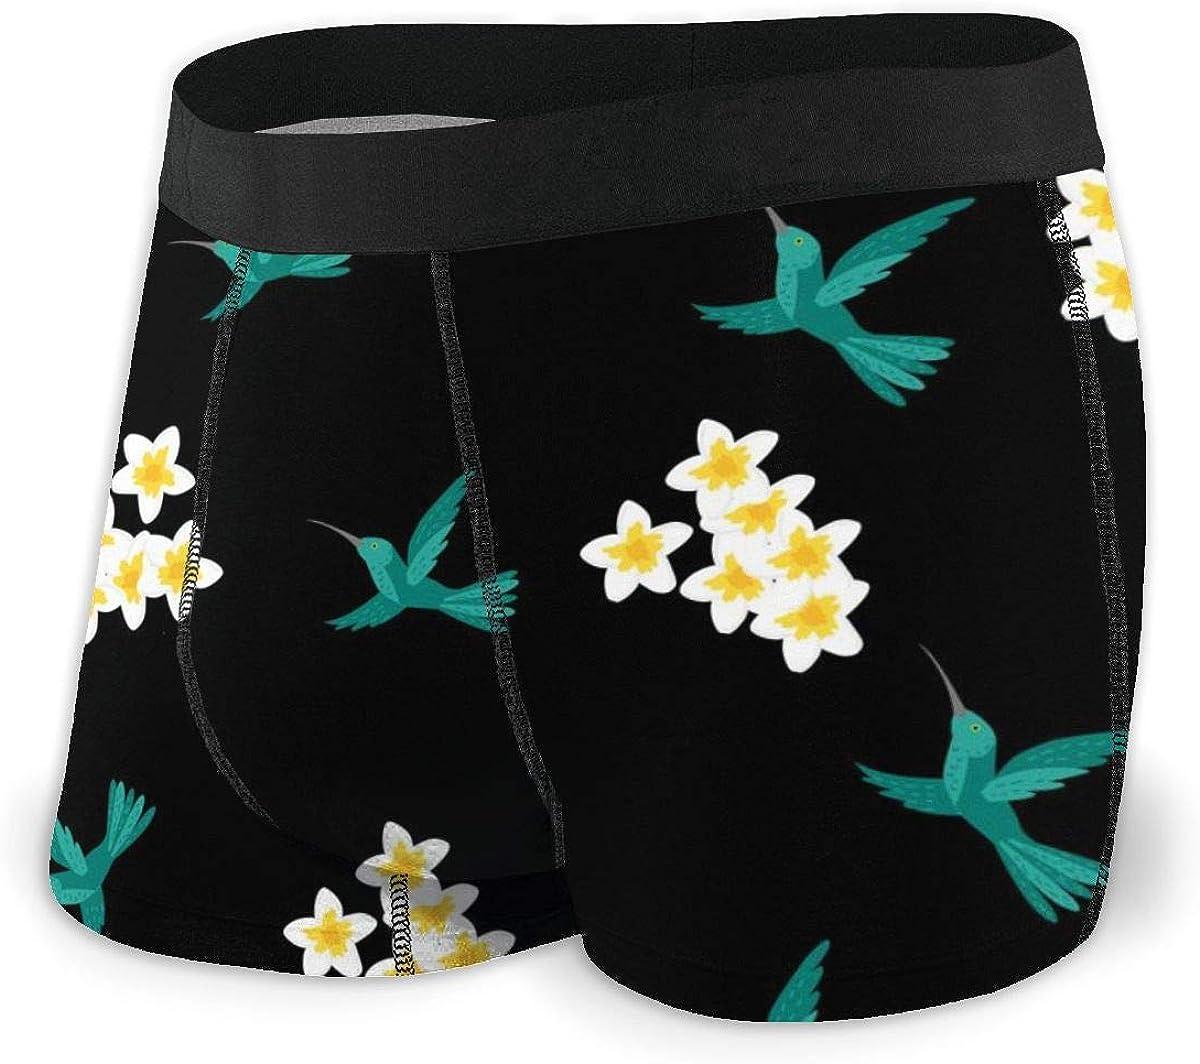 Mens Boxer Briefs Floral Birds Hummingbird, Hibiscus Flowers Breathable Underwear